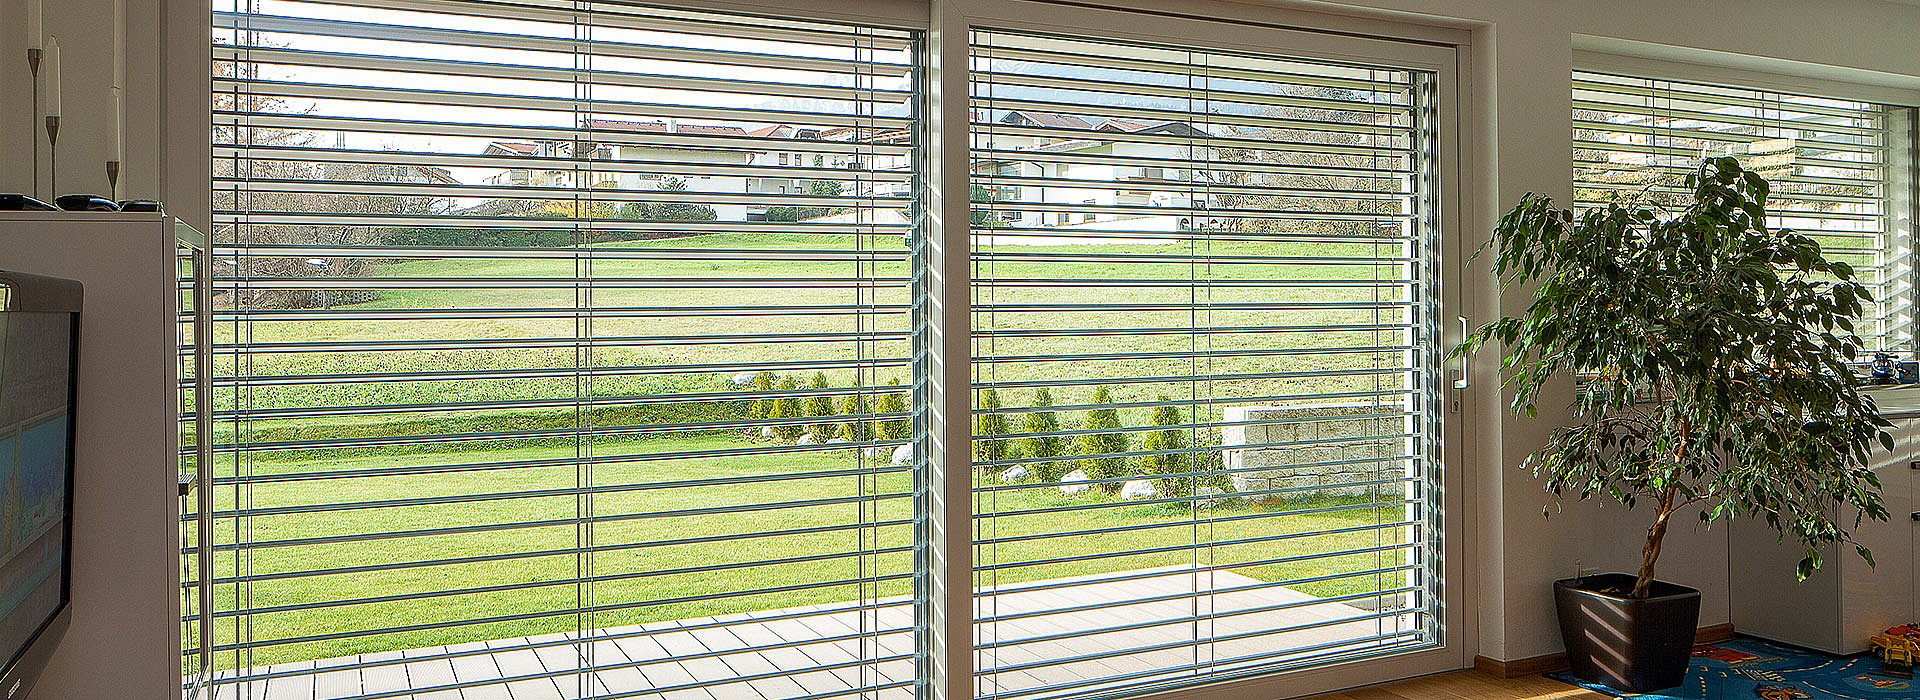 Home posch fenster t ren for Fenster 0 95